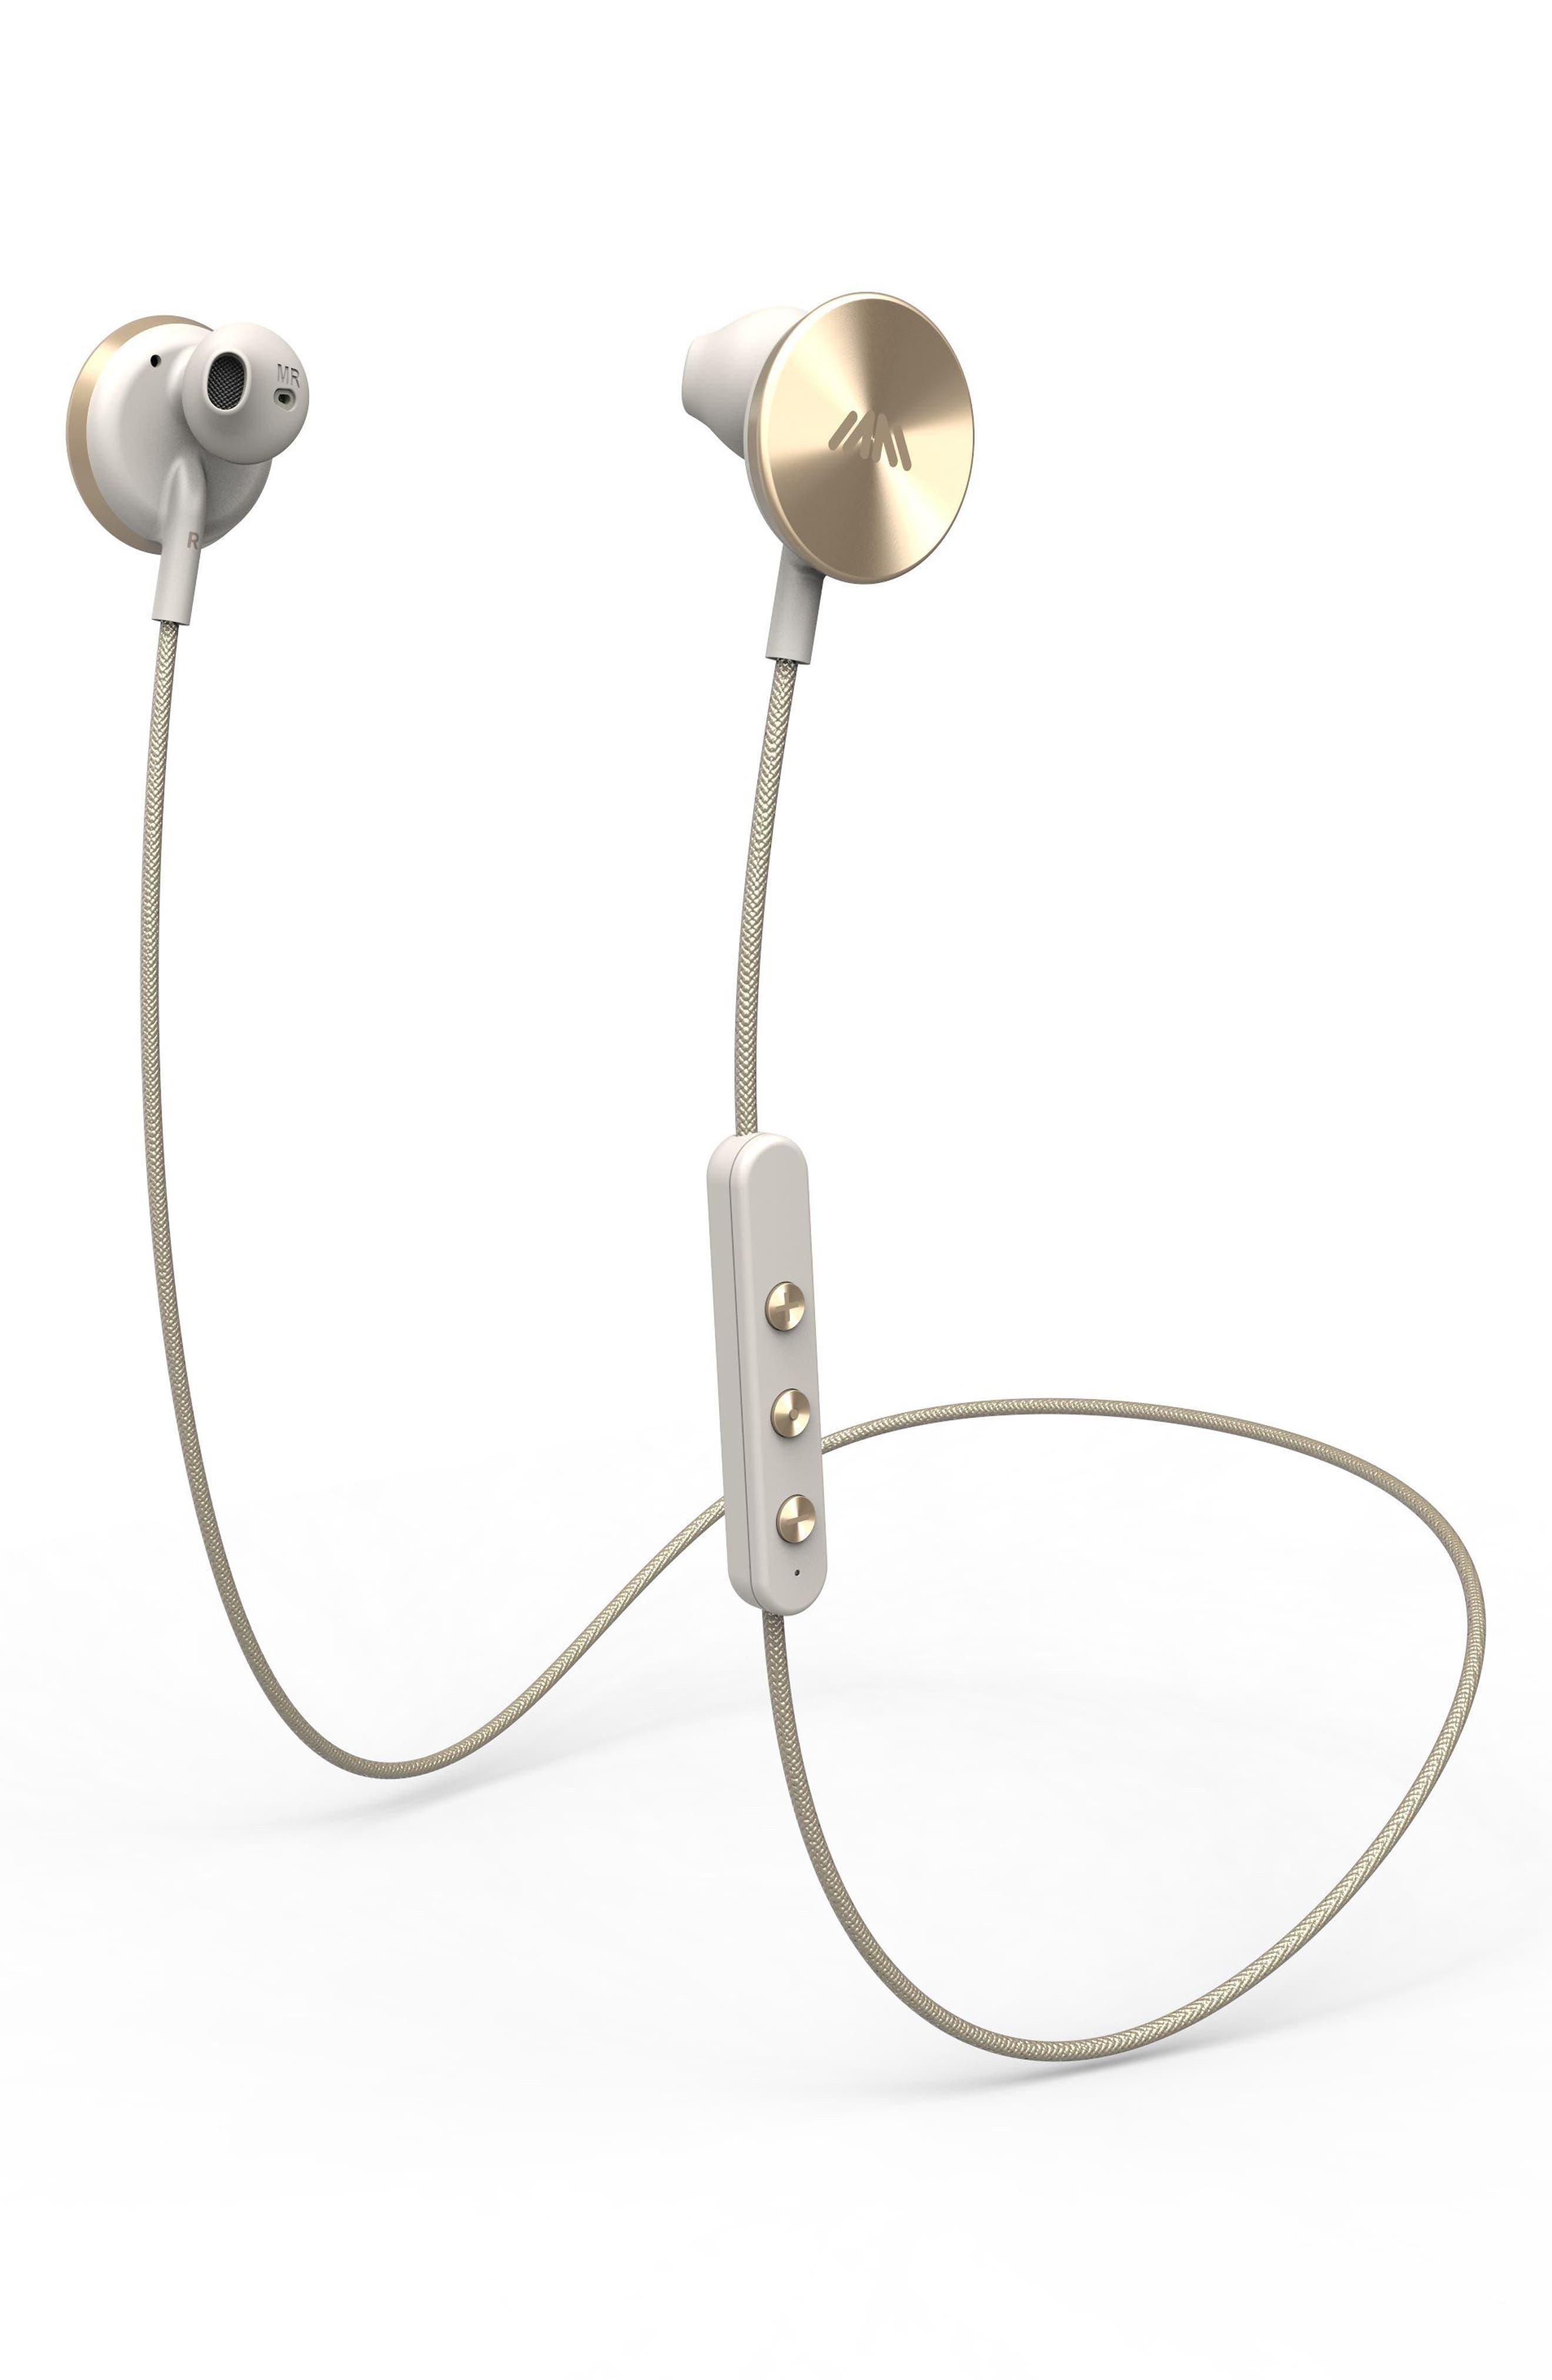 IAMPLUS i.am+ Buttons Bluetooth Headphones